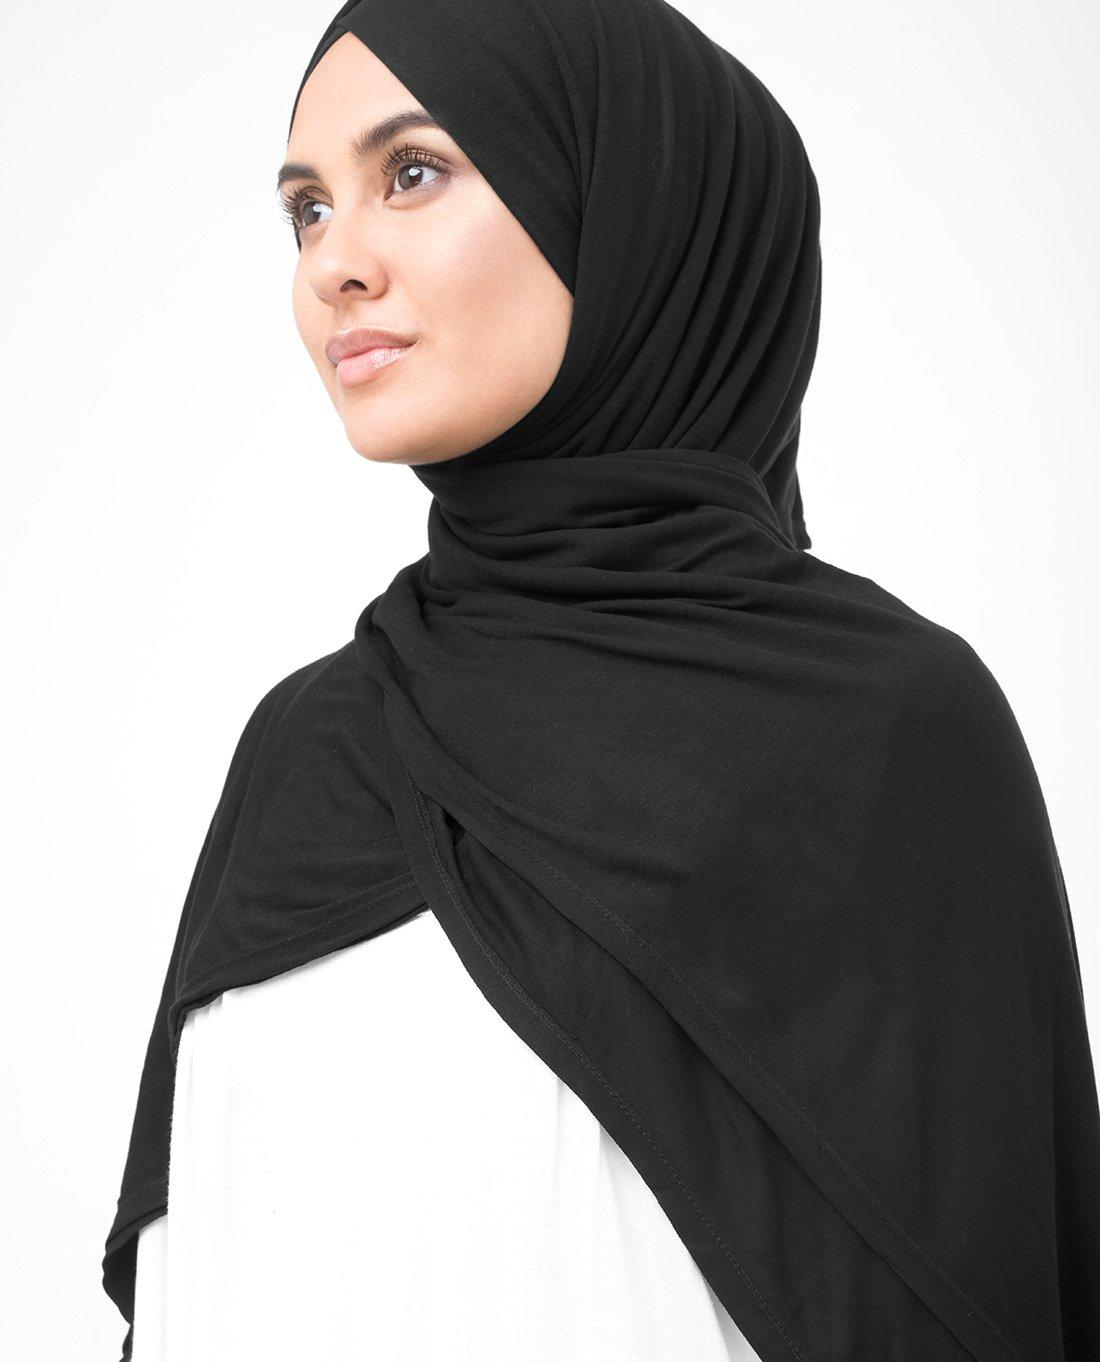 InEssence Jet Black Viscose Jersey Scarf Women Girls Wrap Medium Size Hijab by InEssence (Image #2)